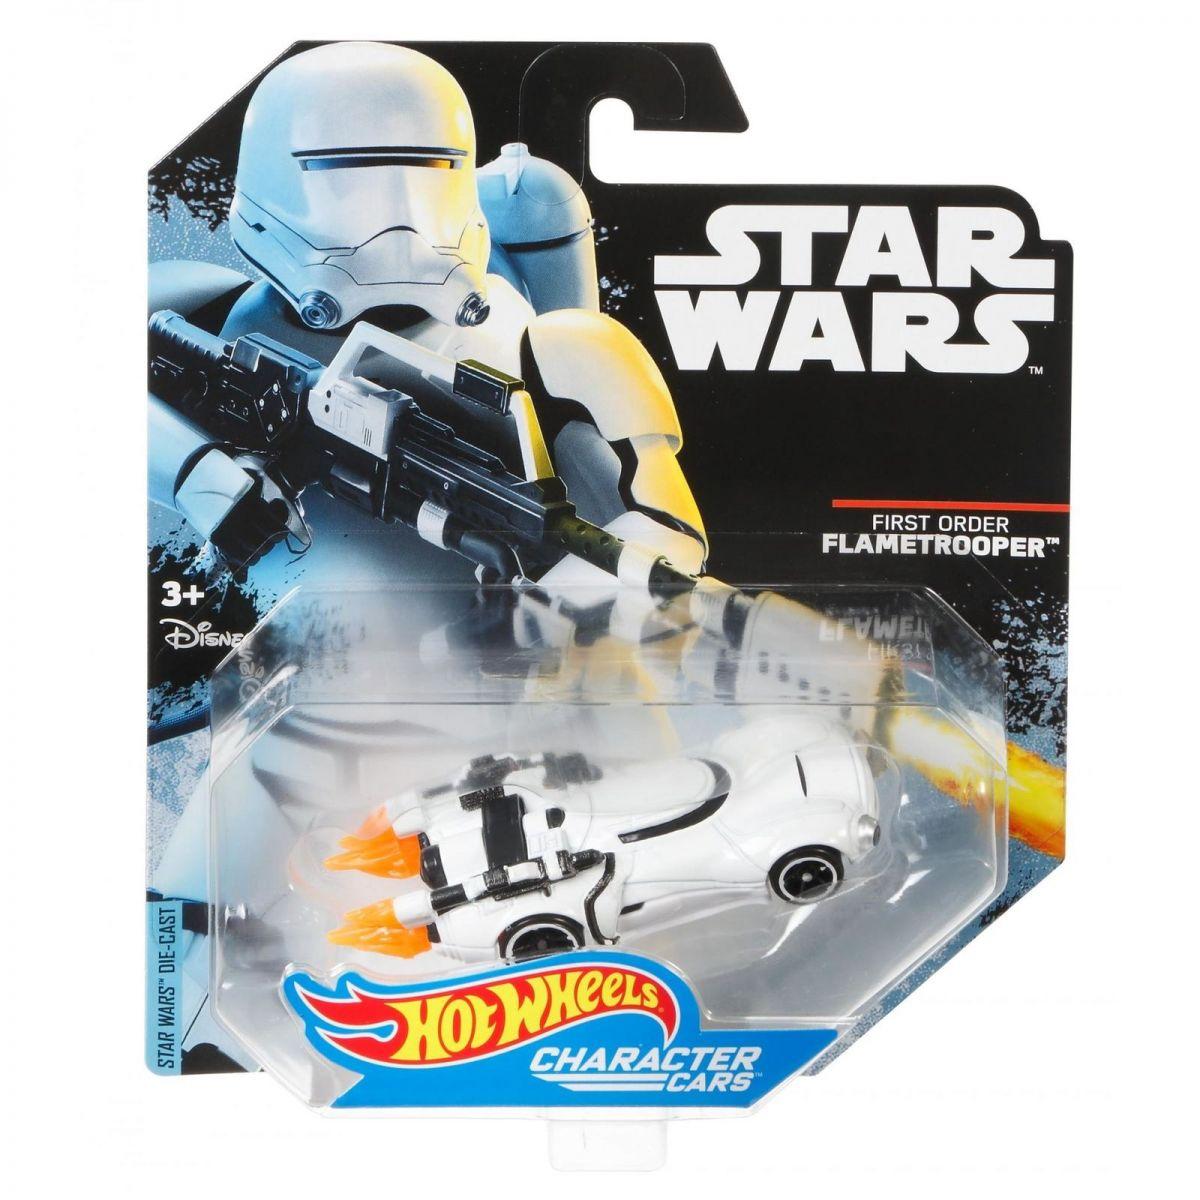 Star Wars: First Order Flametrooper - Hot Wheels